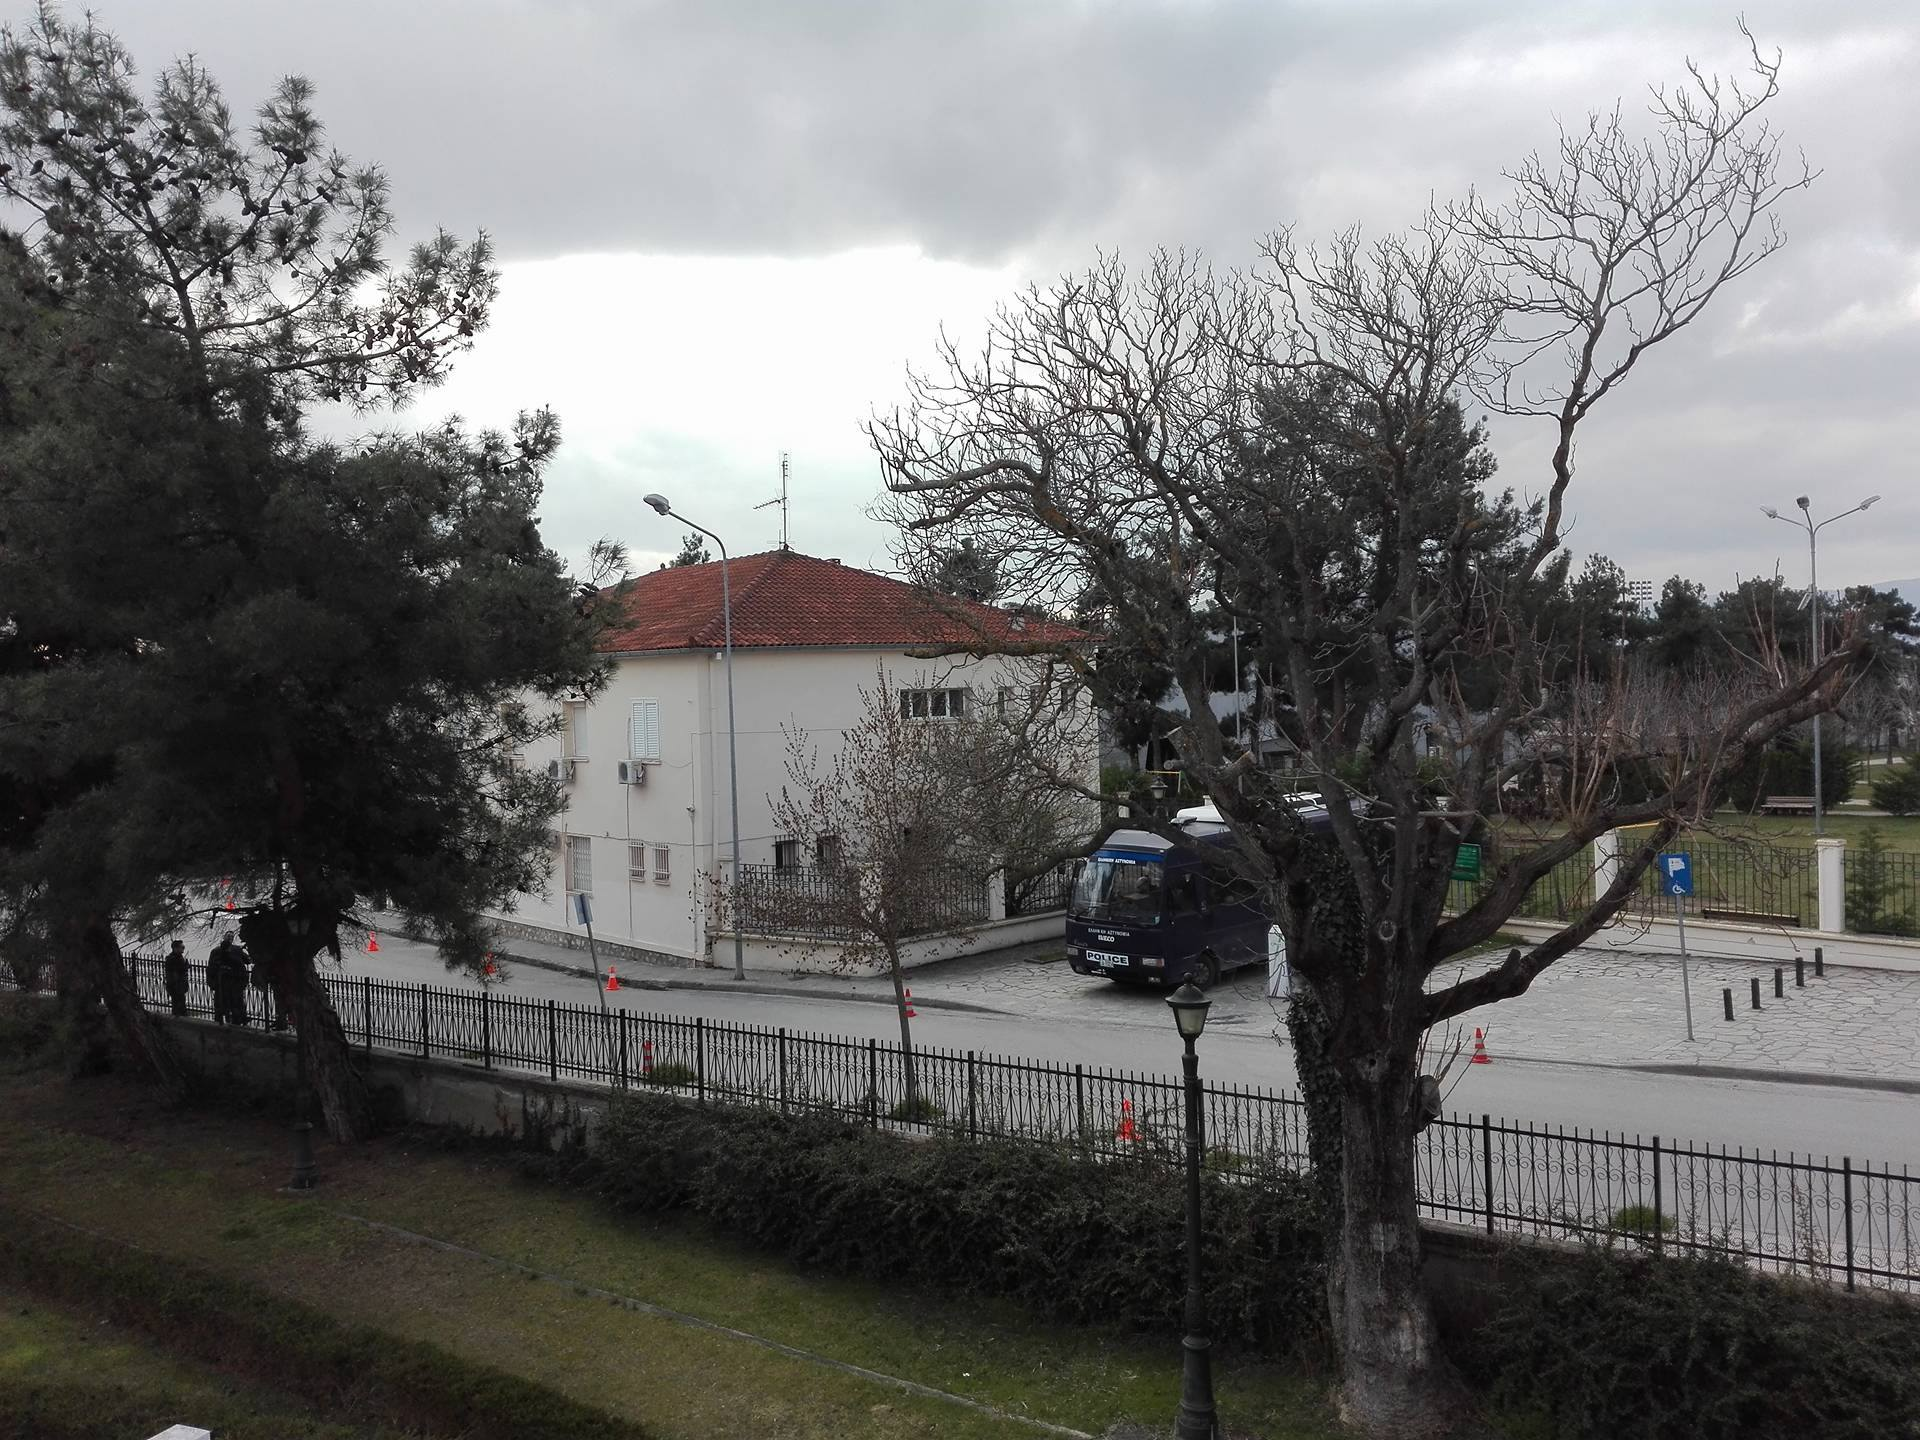 kozan.gr: Ισχυρή αστυνομική δύναμη, αυτή την ώρα, στην Στρατολογία Κοζάνης (Φωτογραφίες)